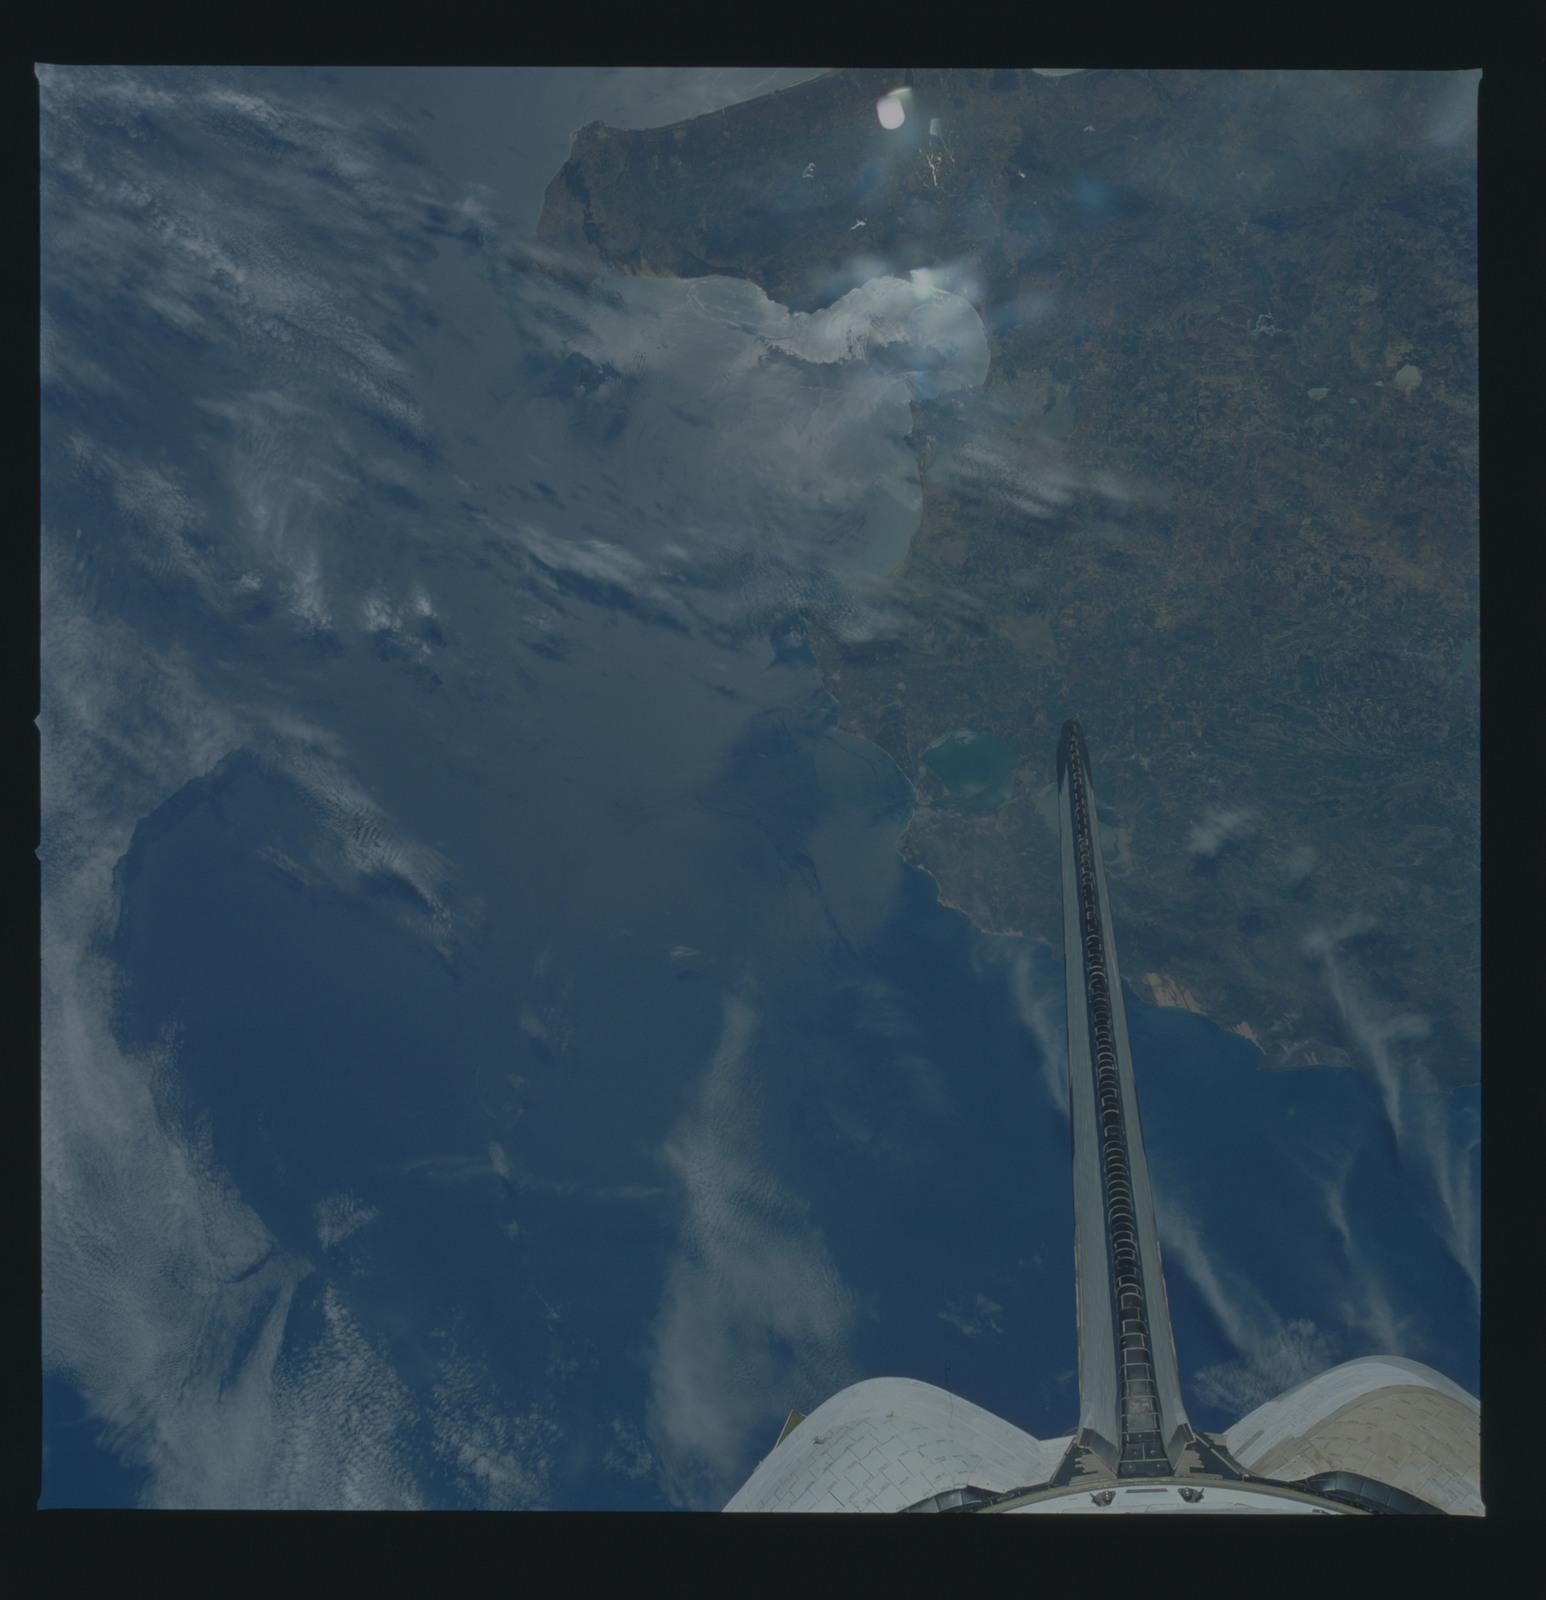 51B-37-009 - STS-51B - 51B earth observation